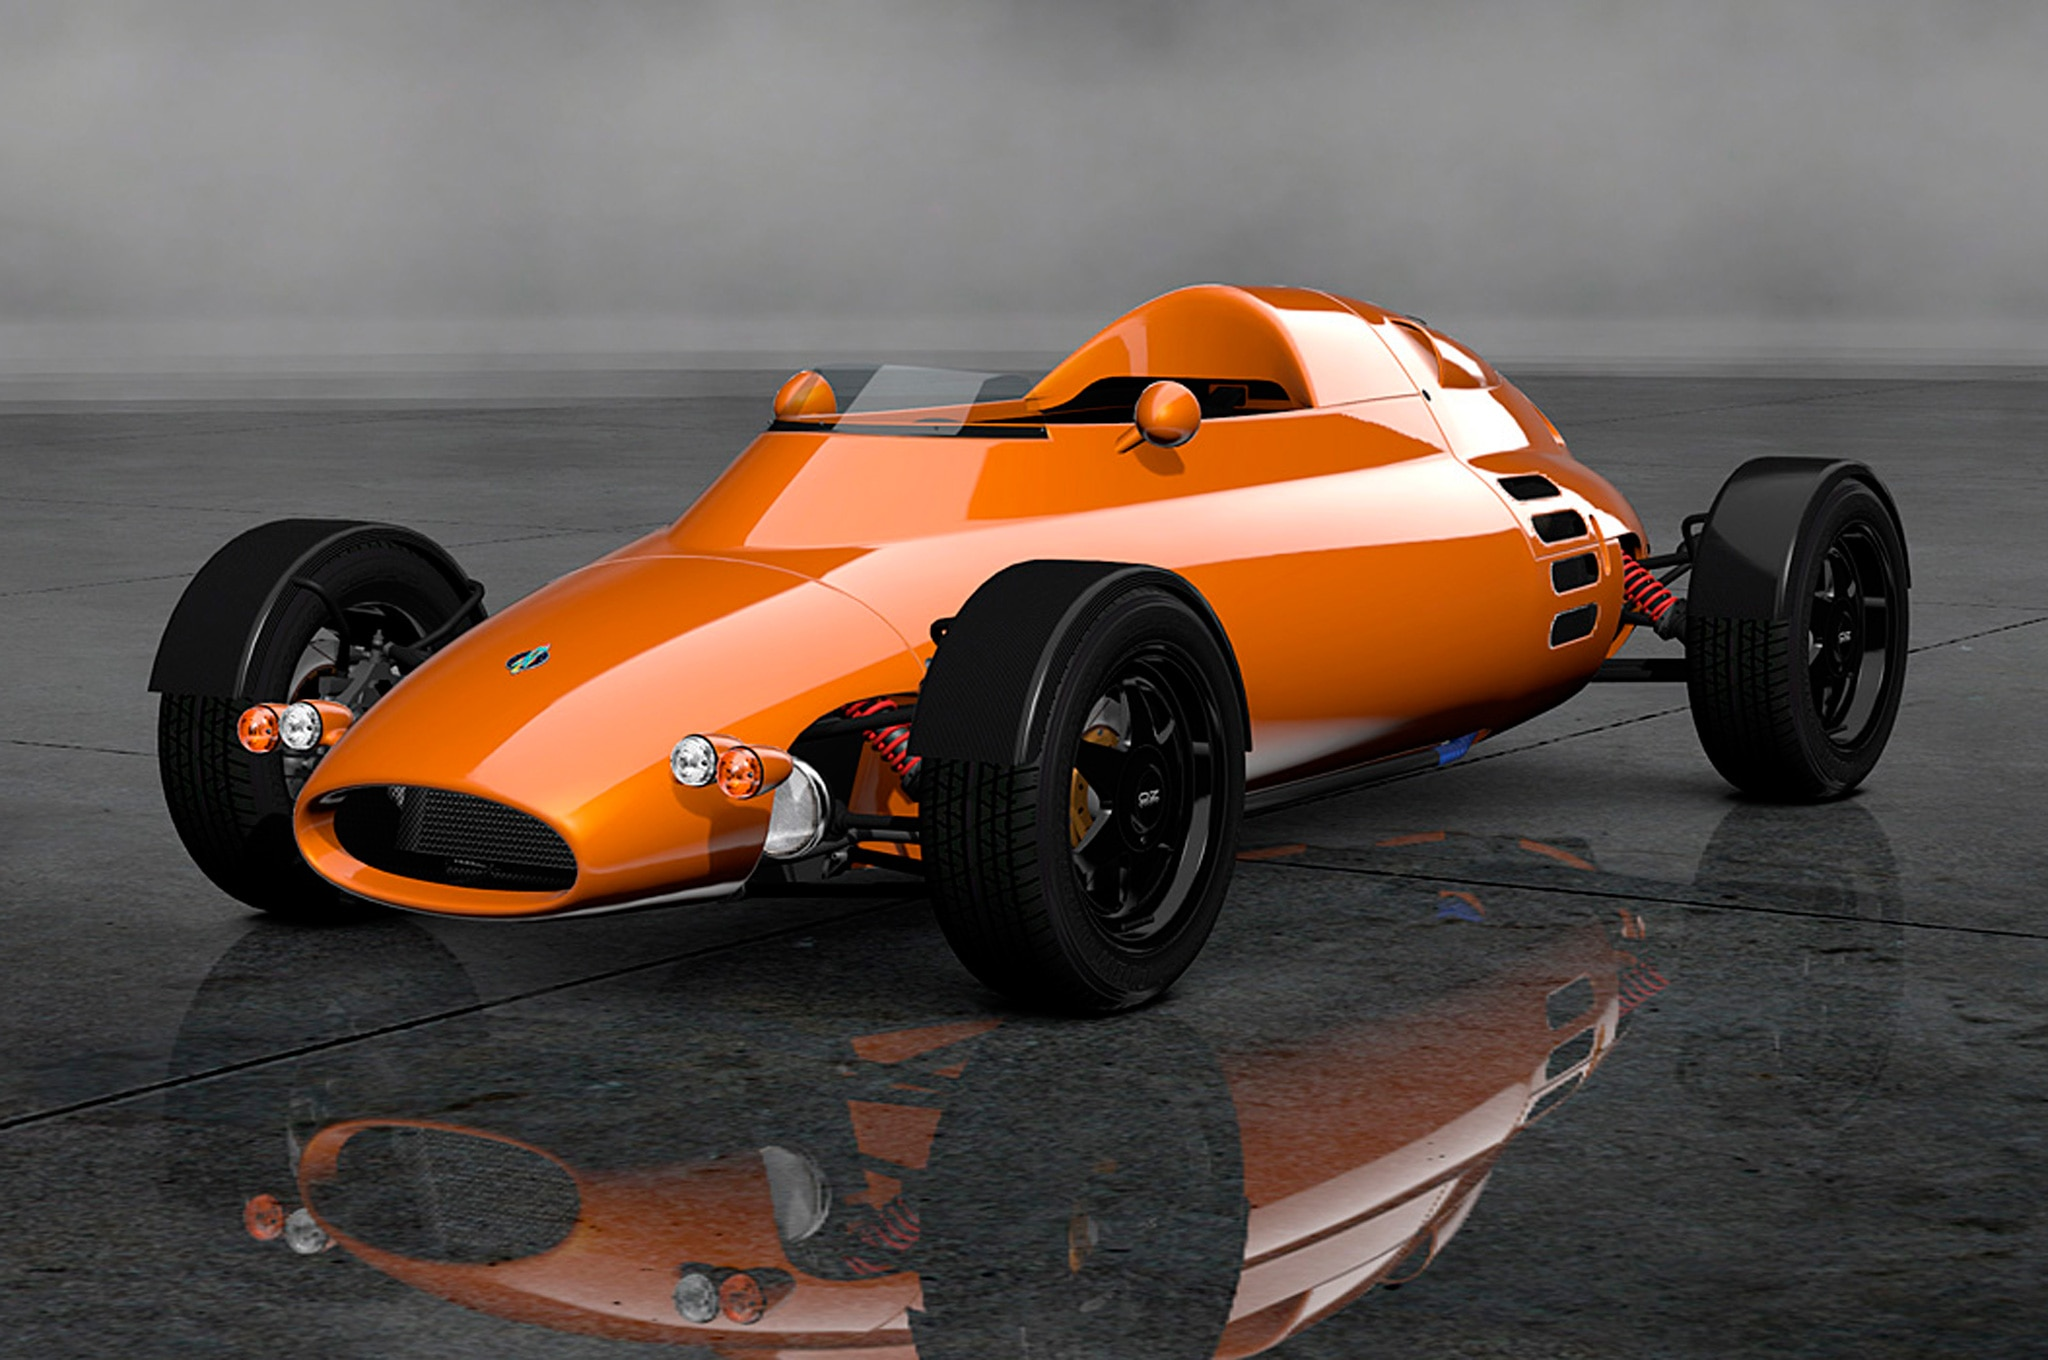 Turismo Car: The Ten Cars You Must Drive In Gran Turismo 6